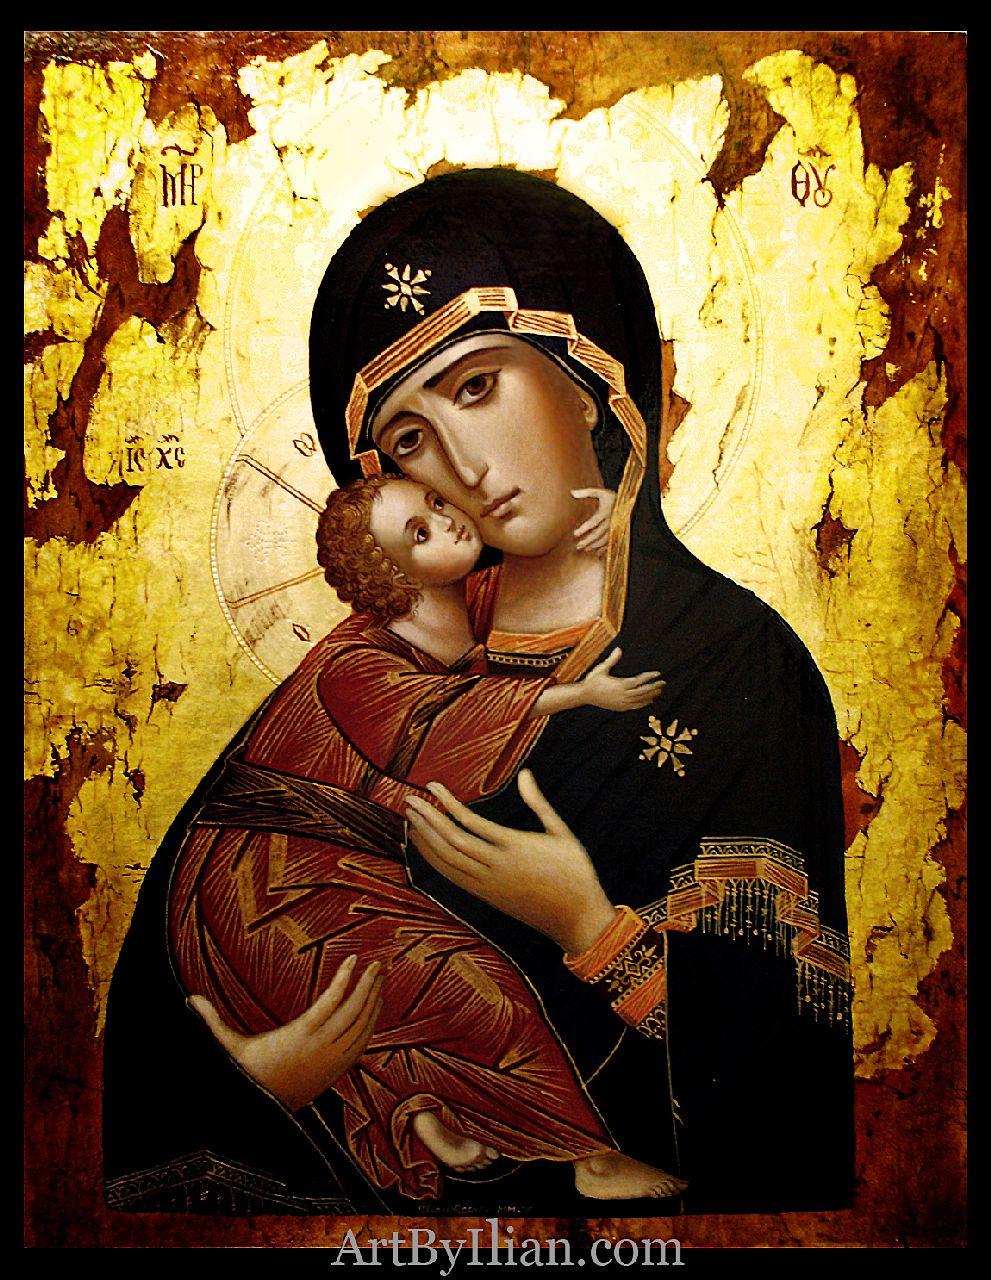 Ilian Rachov 1970 Baroque Era Style Painter Icone Ortodosse Arte Cristiana Icona Ortodossa